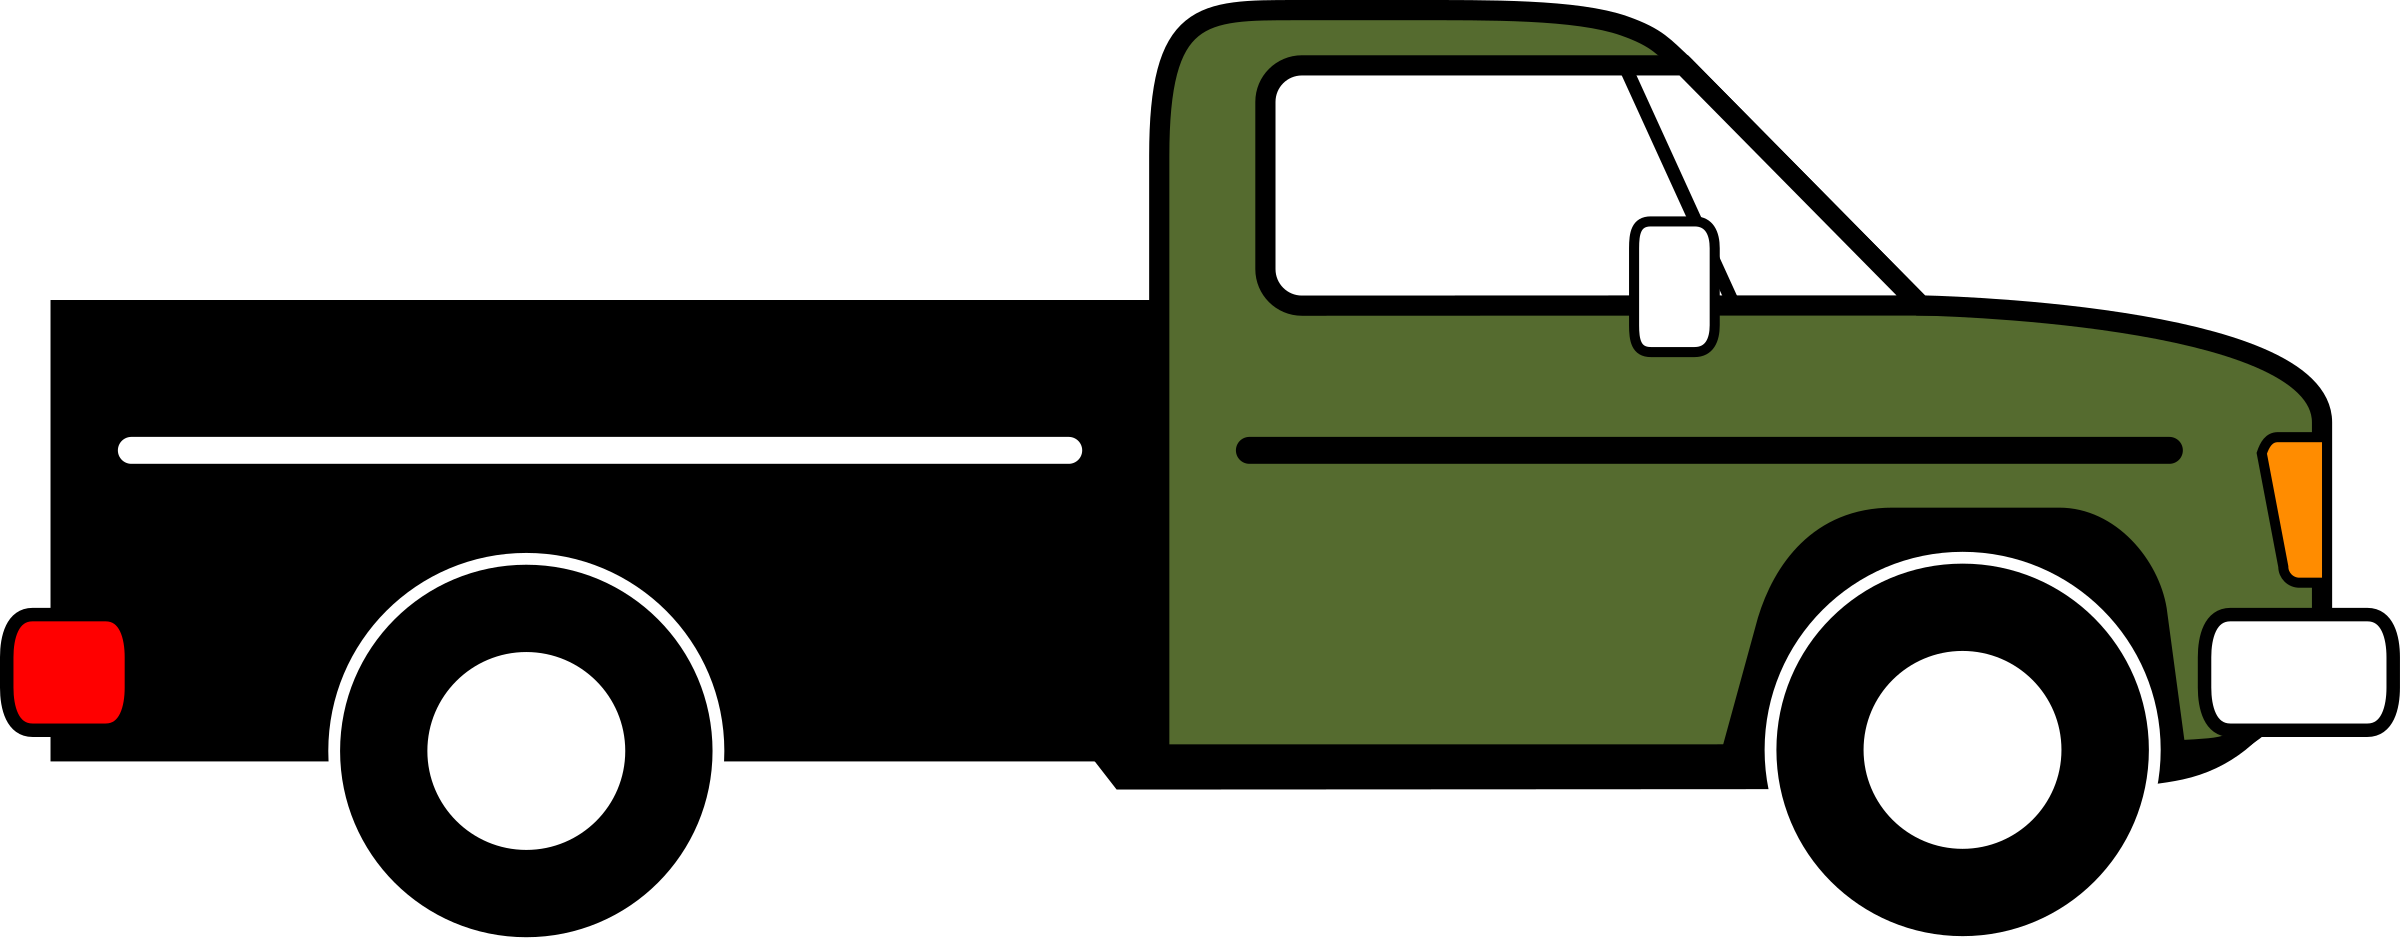 2400x949 Clip Art Pickup Truck Clip Art